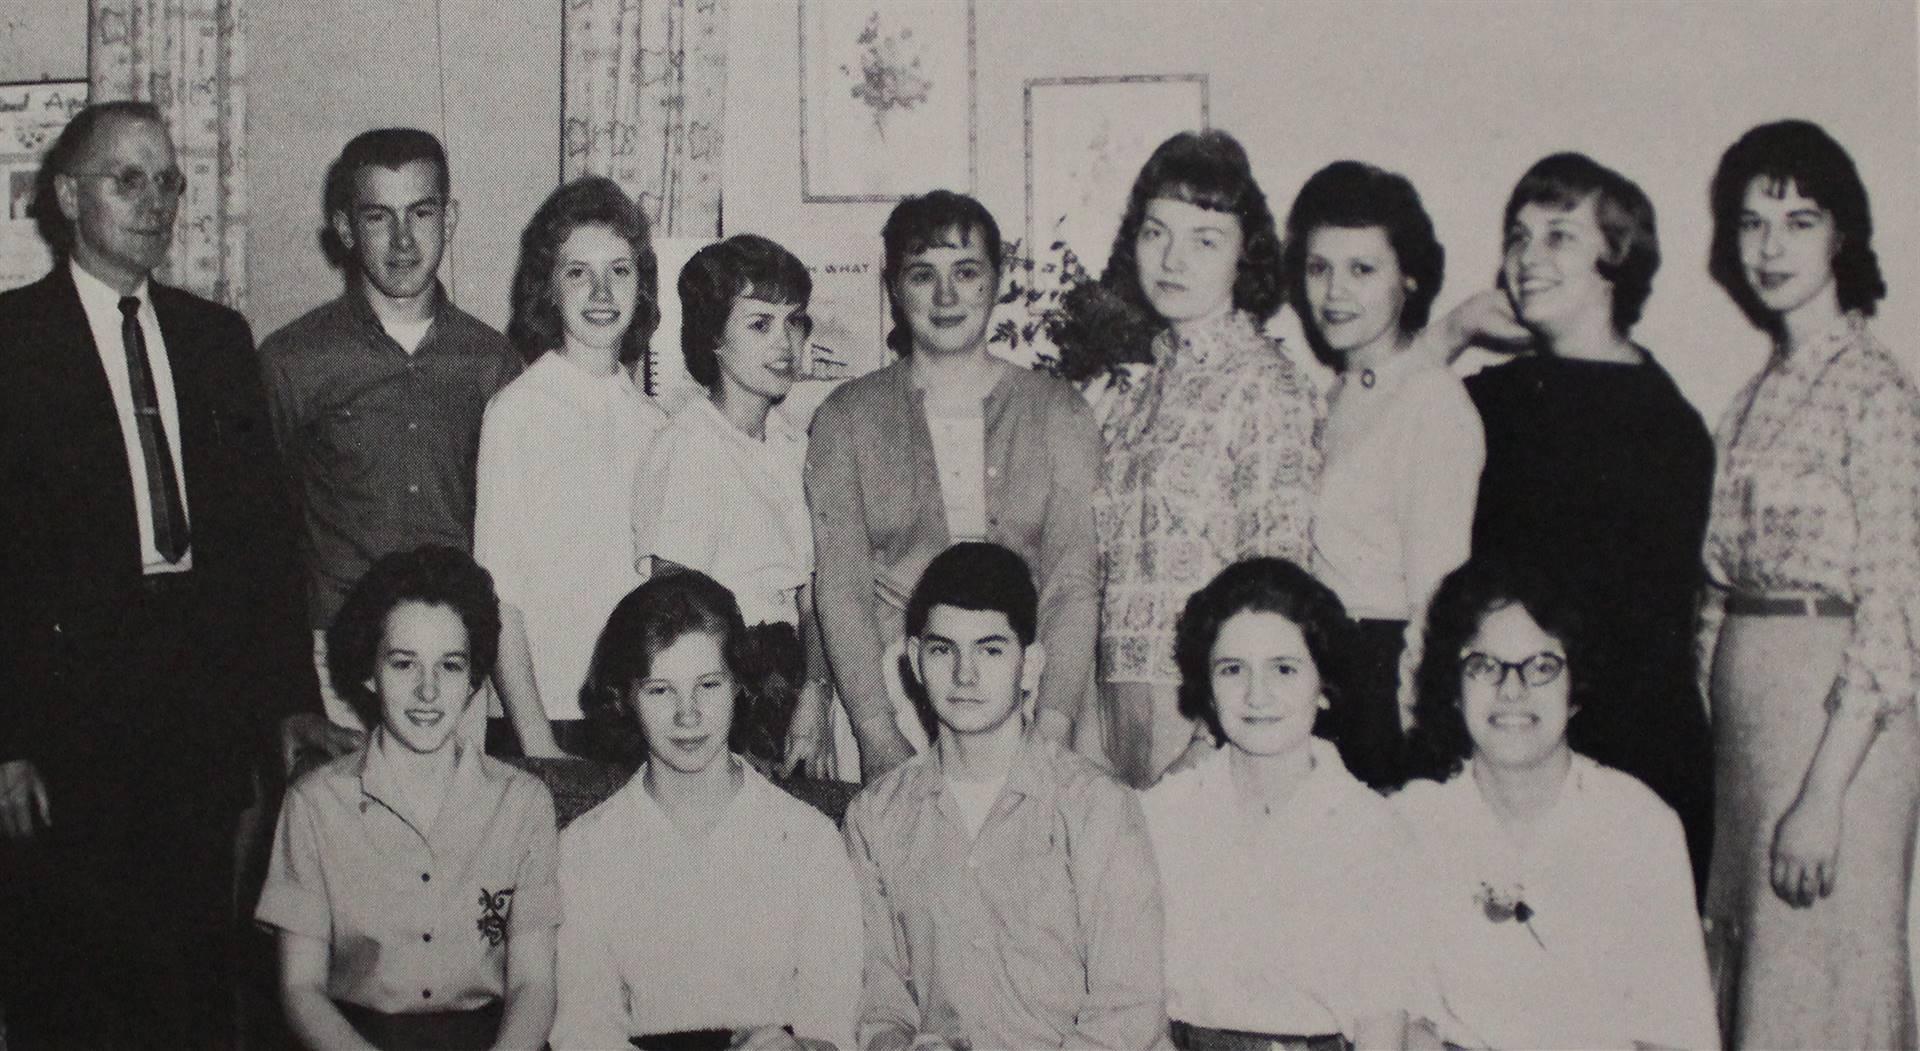 1961 NHS